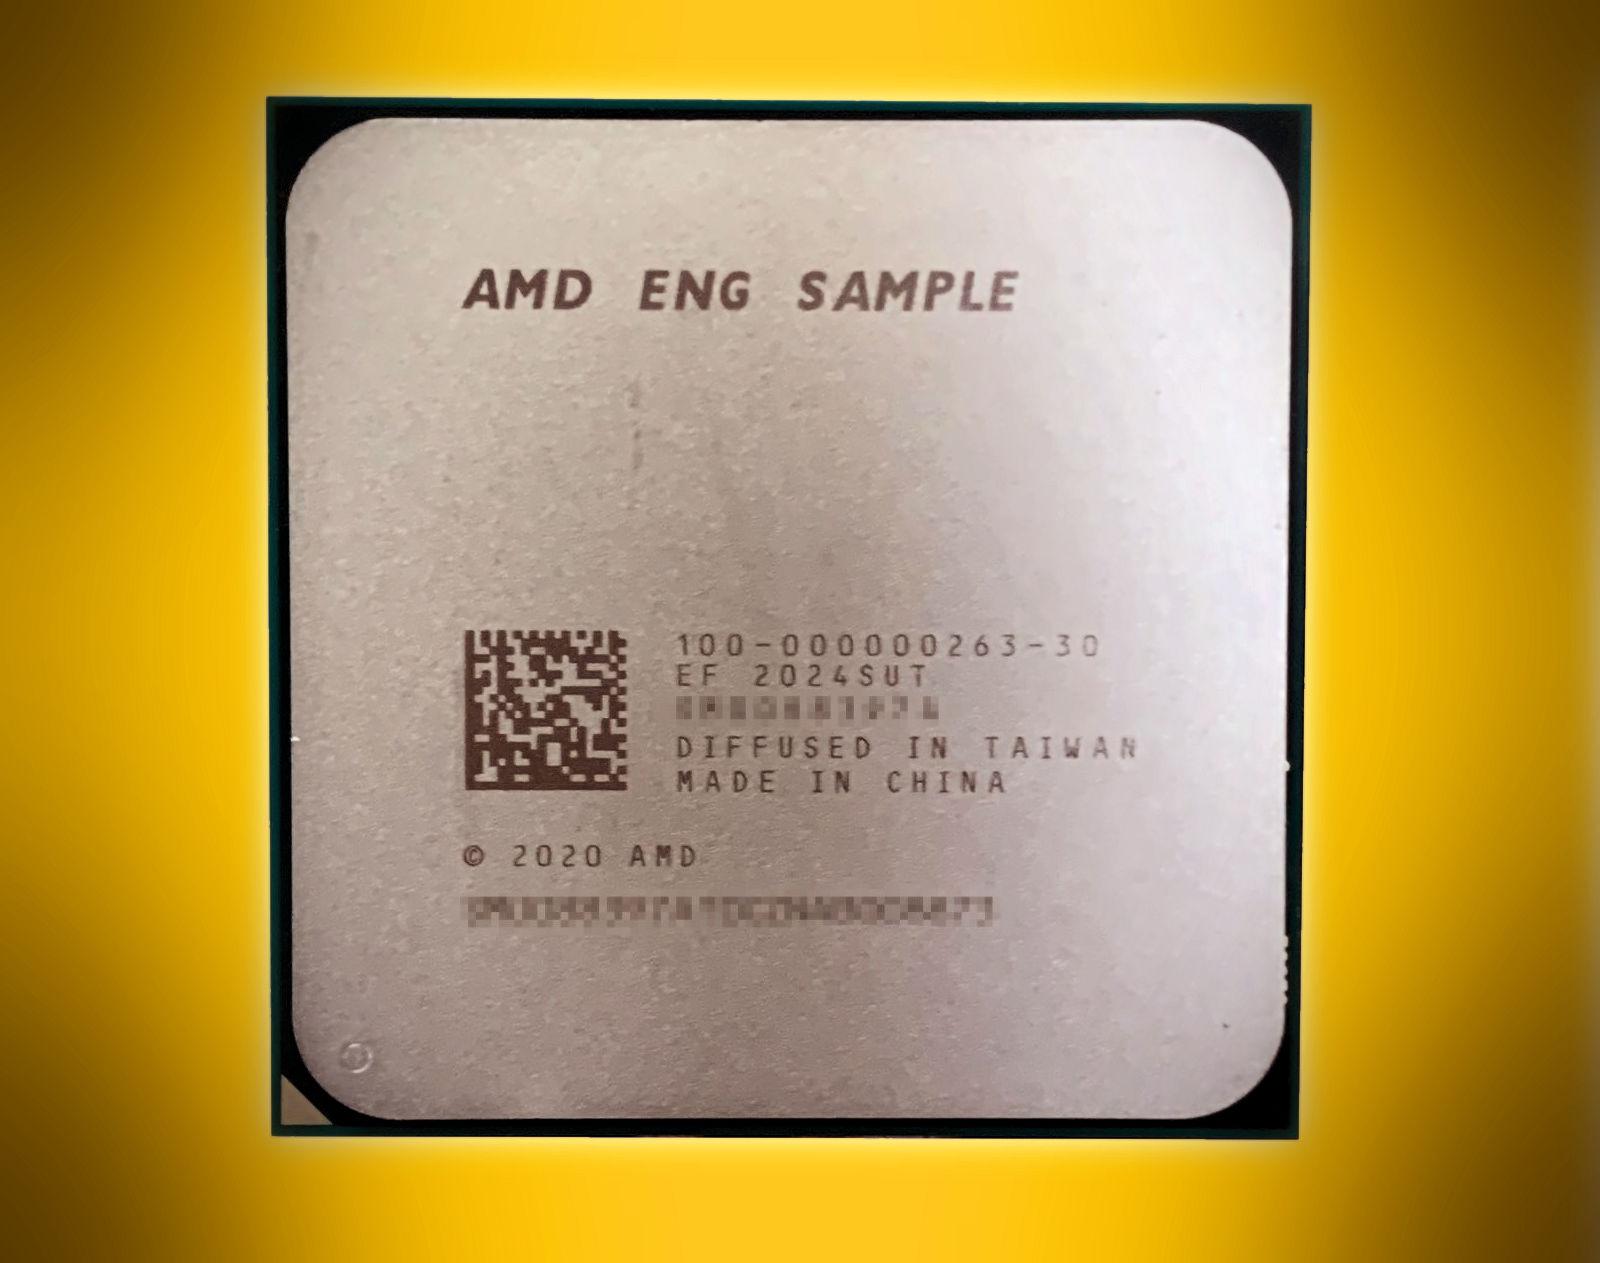 AMD Ryzen 7 5700G engineering sample again tested in CPU-Z benchmark – VideoCardz.com